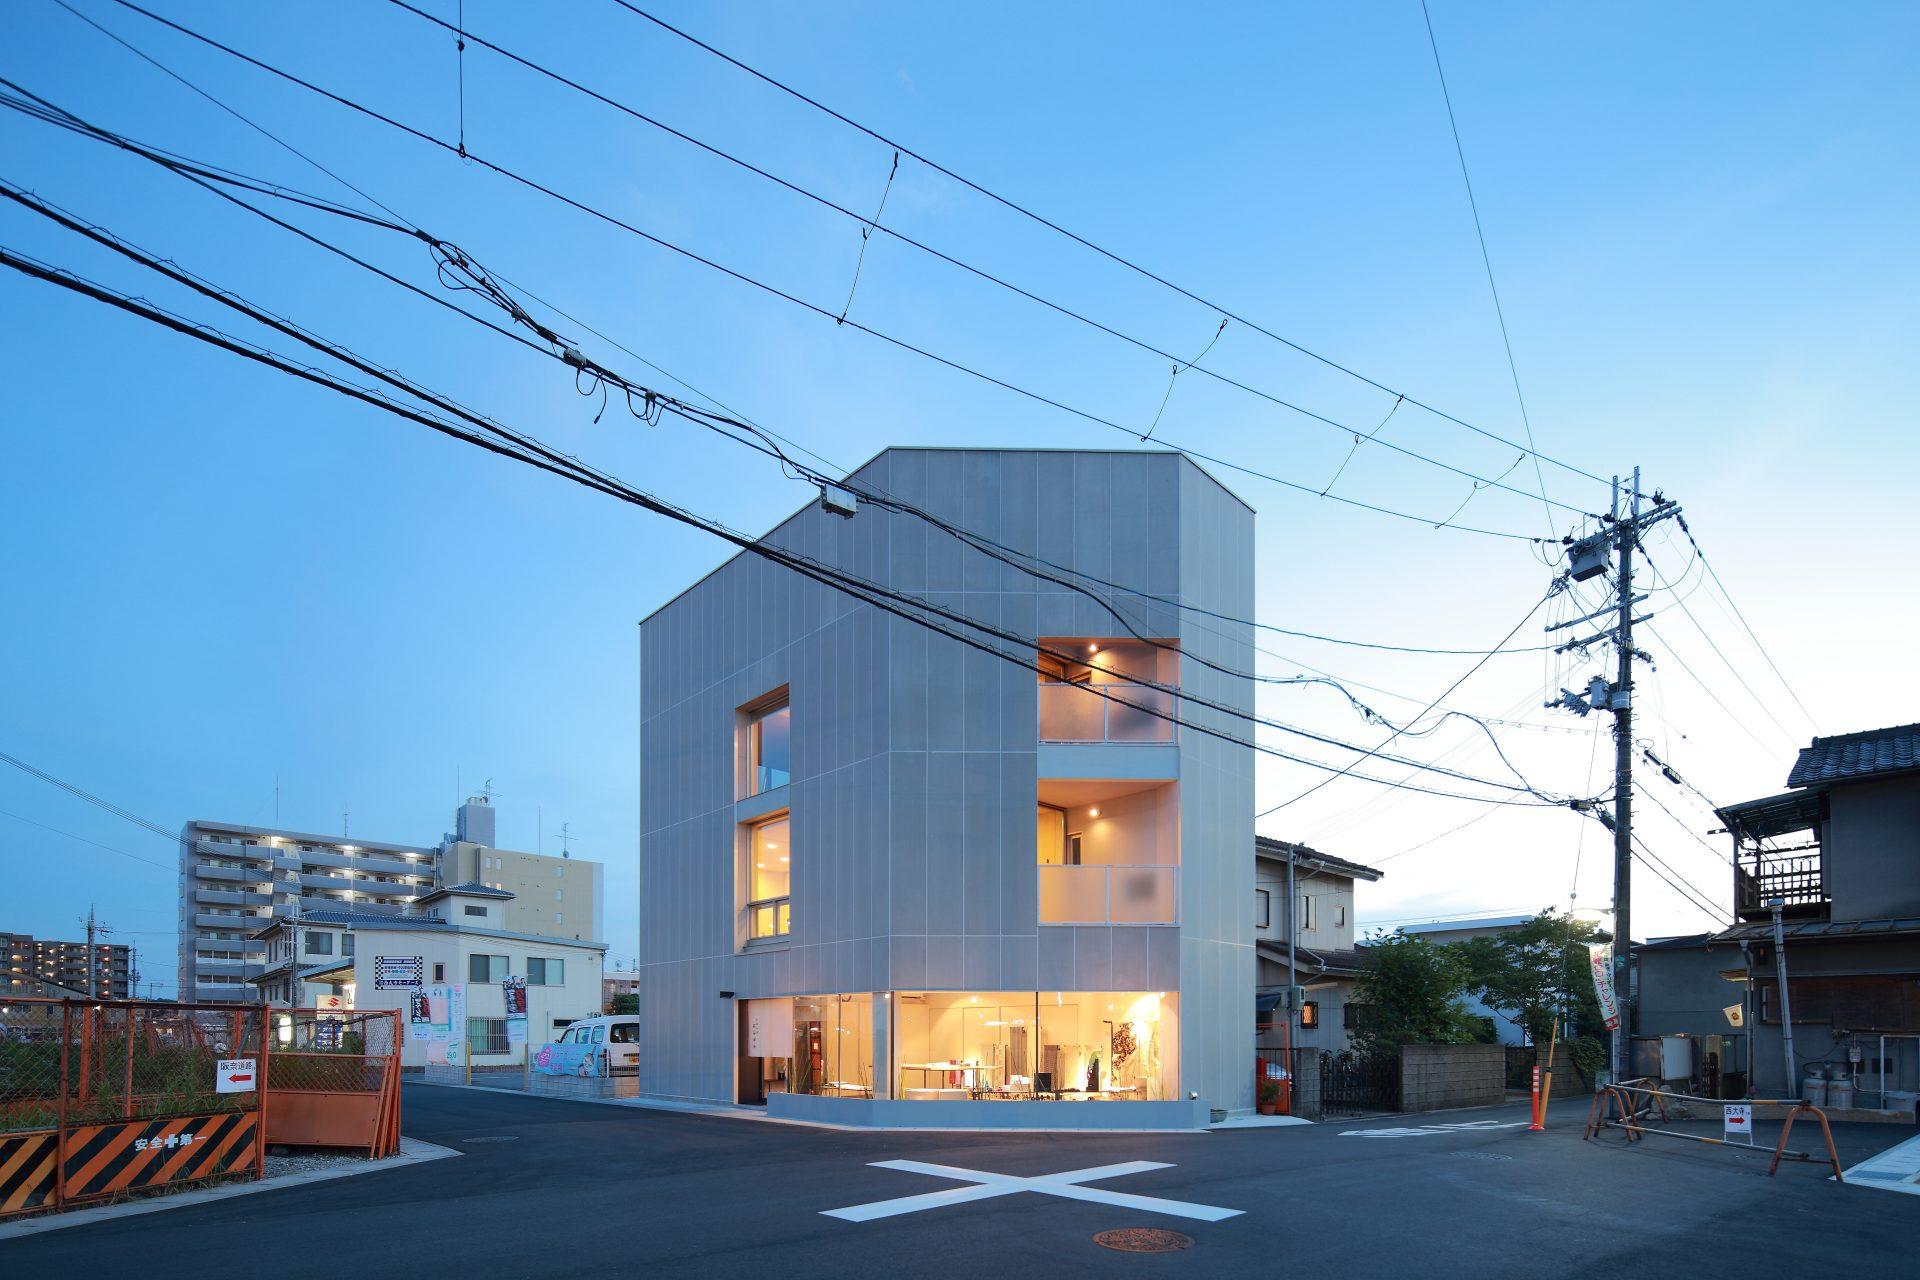 奈良西大寺の店舗+住宅の外観(夜景)01